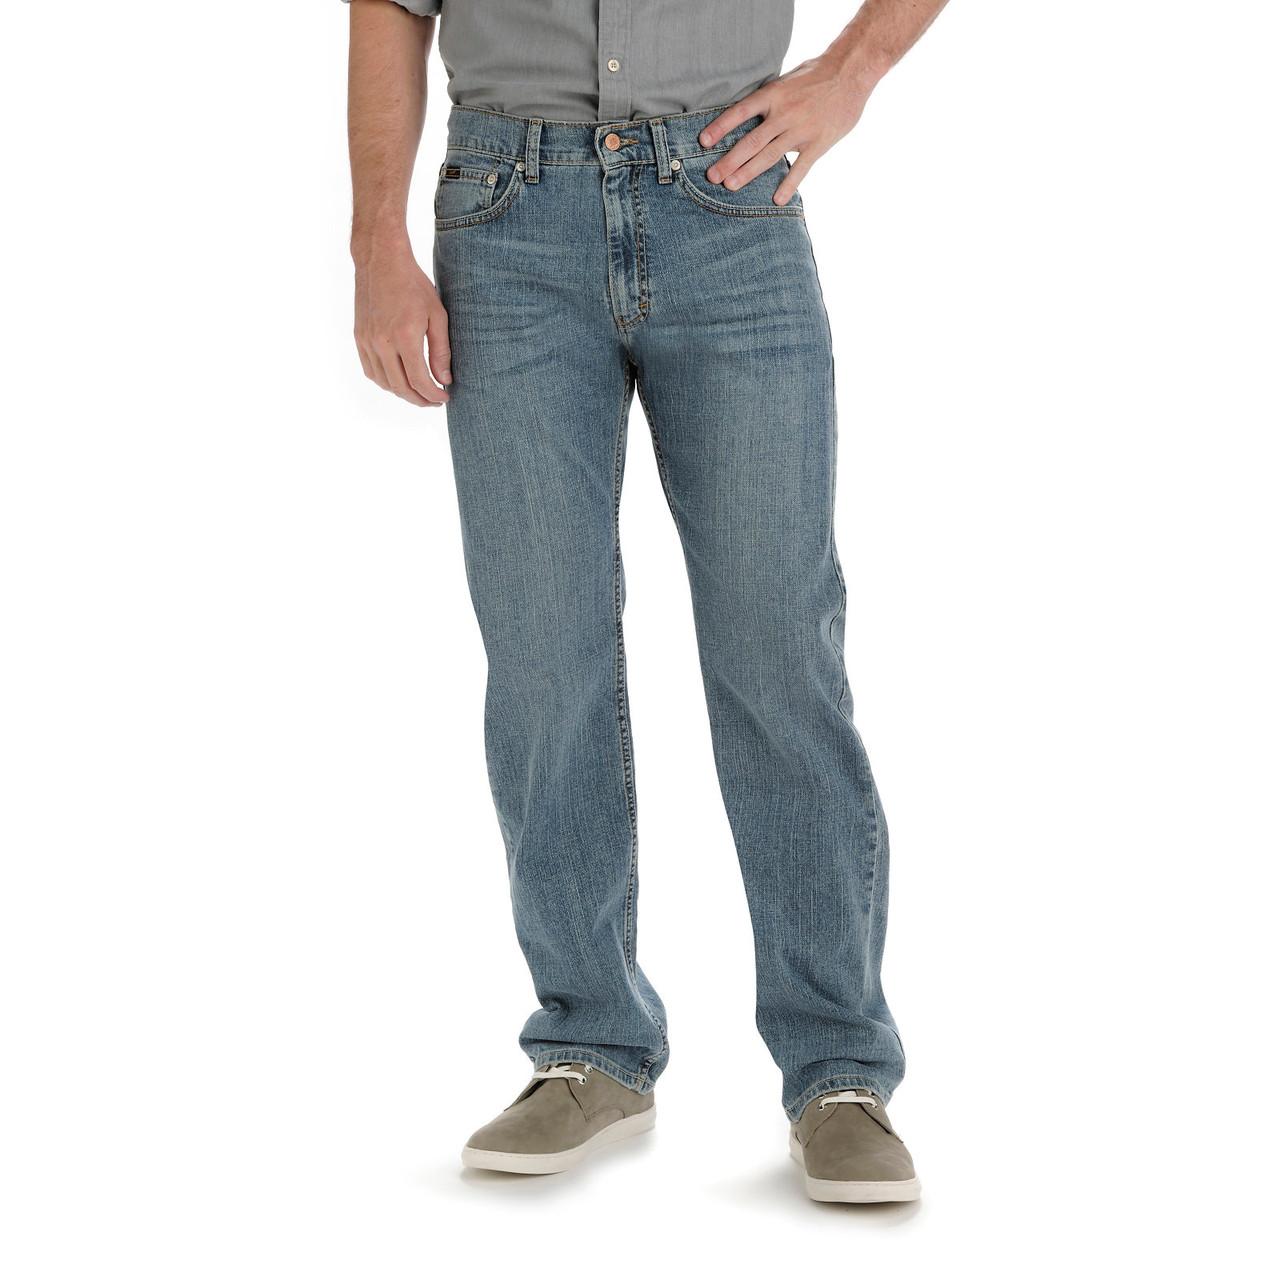 Джинсы Lee Premium Select Regular Fit Straight Leg, Phantom, 34W30L, 2001945